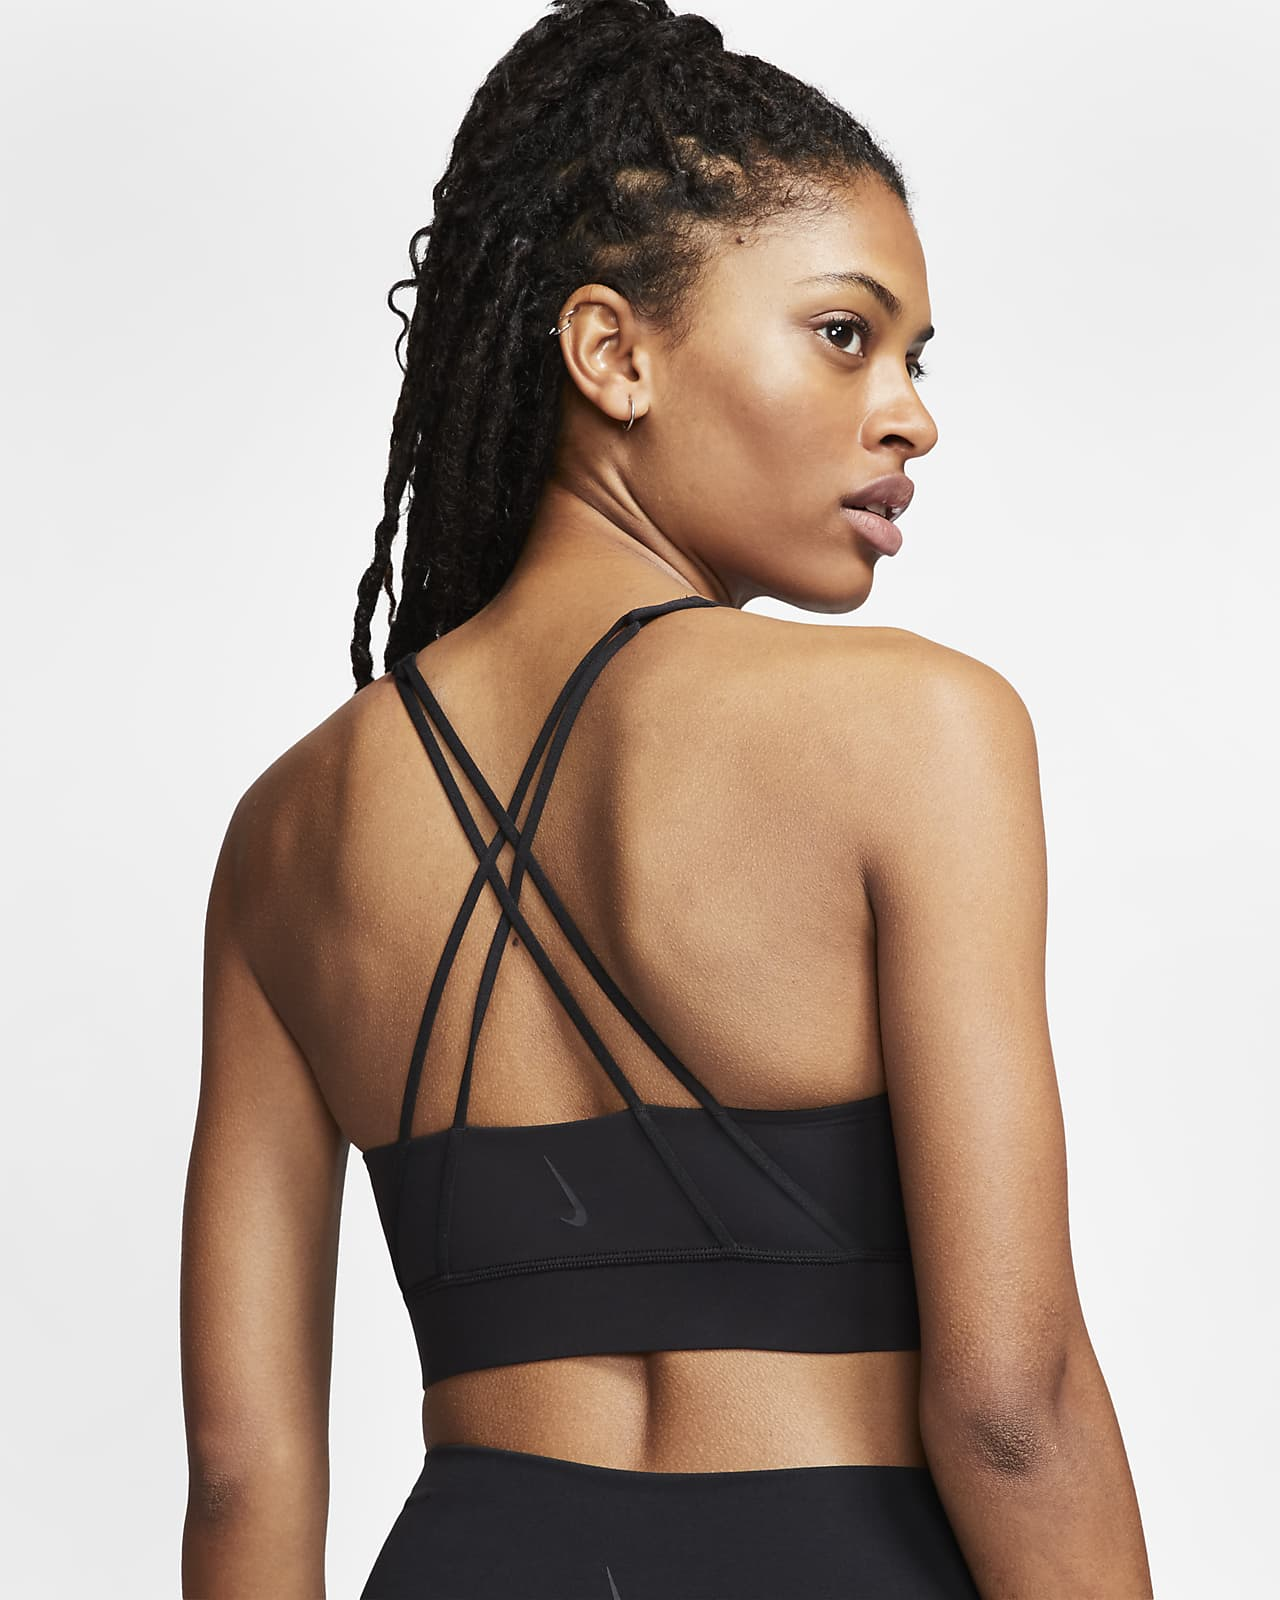 Nike Dri-FIT Swoosh Luxe Women's Medium-Support Padded Longline Sports Bra